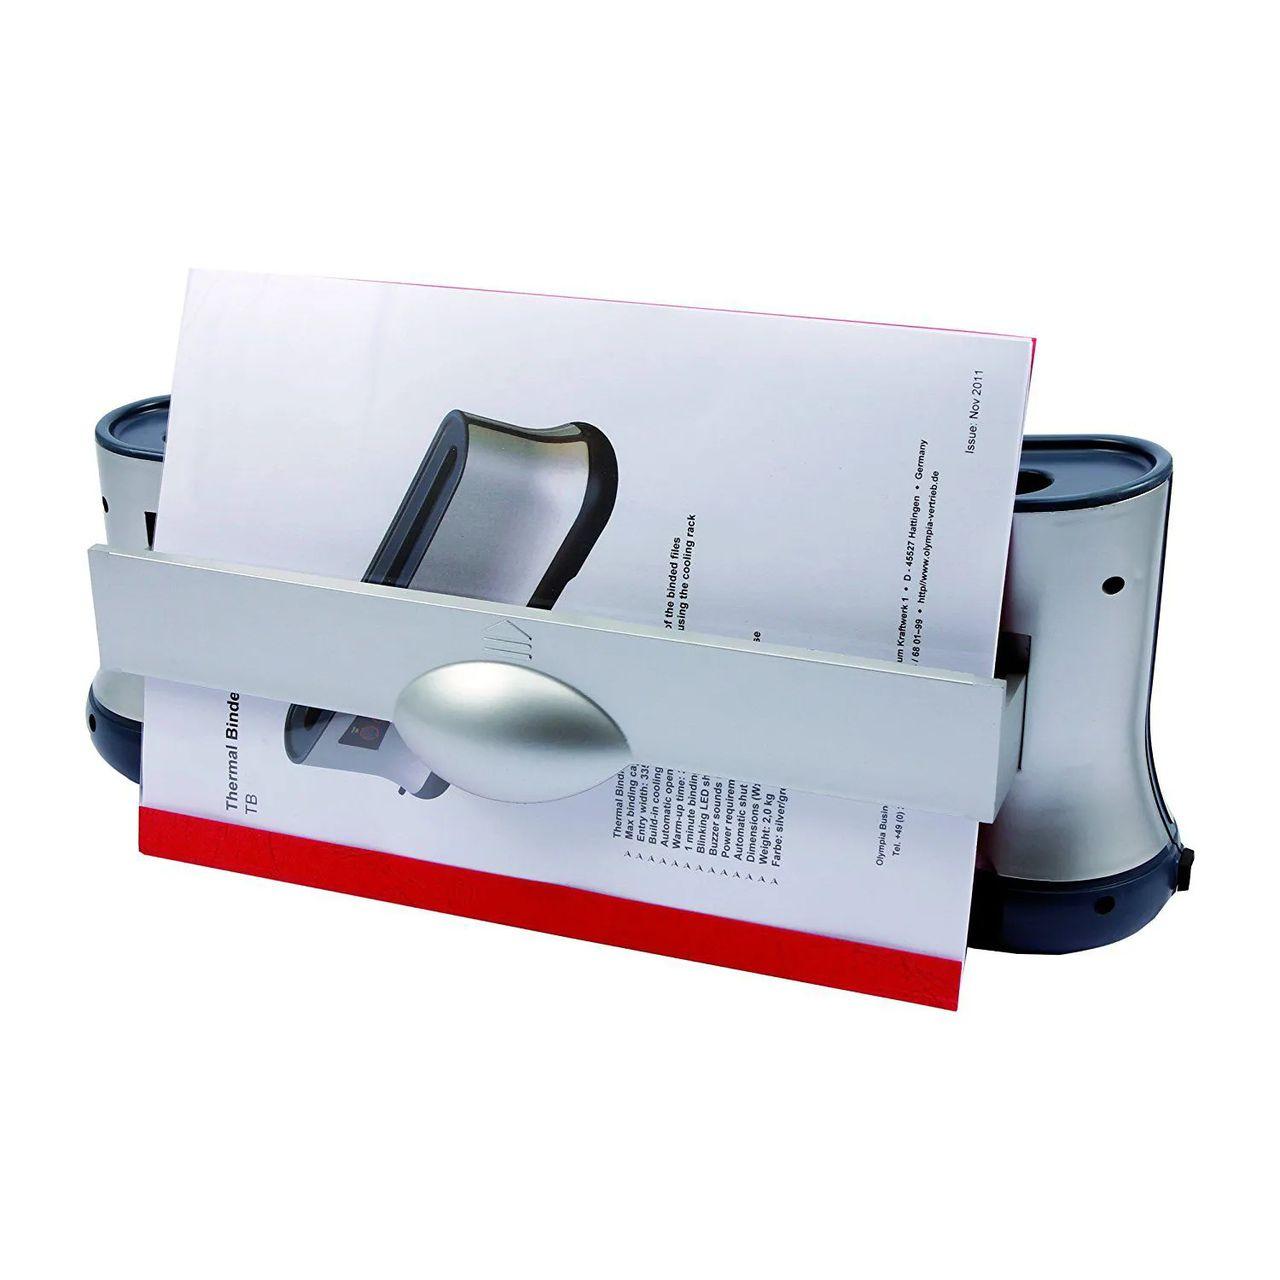 Encadernadora Térmica (termo) Bivolt Capacidade 120 Folhas